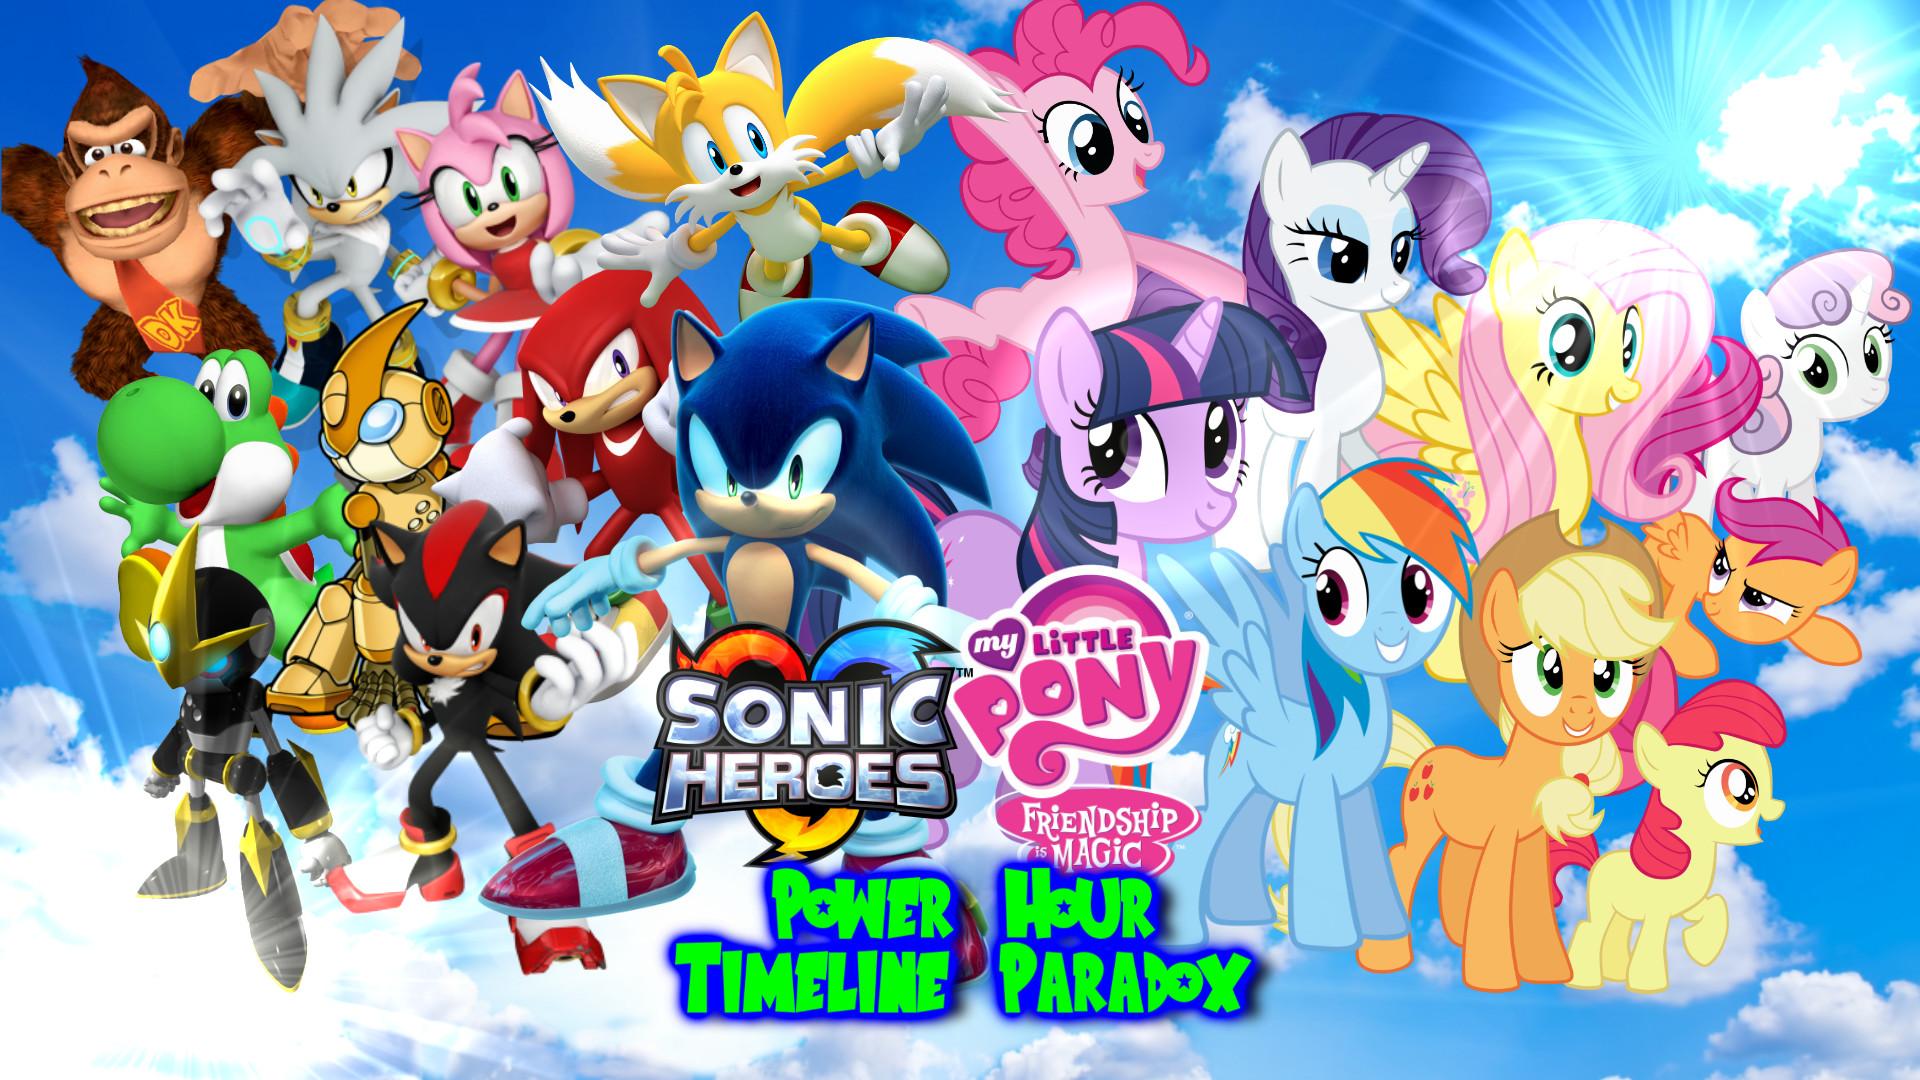 Sonic Adventure 2 Wallpaper 73 Images